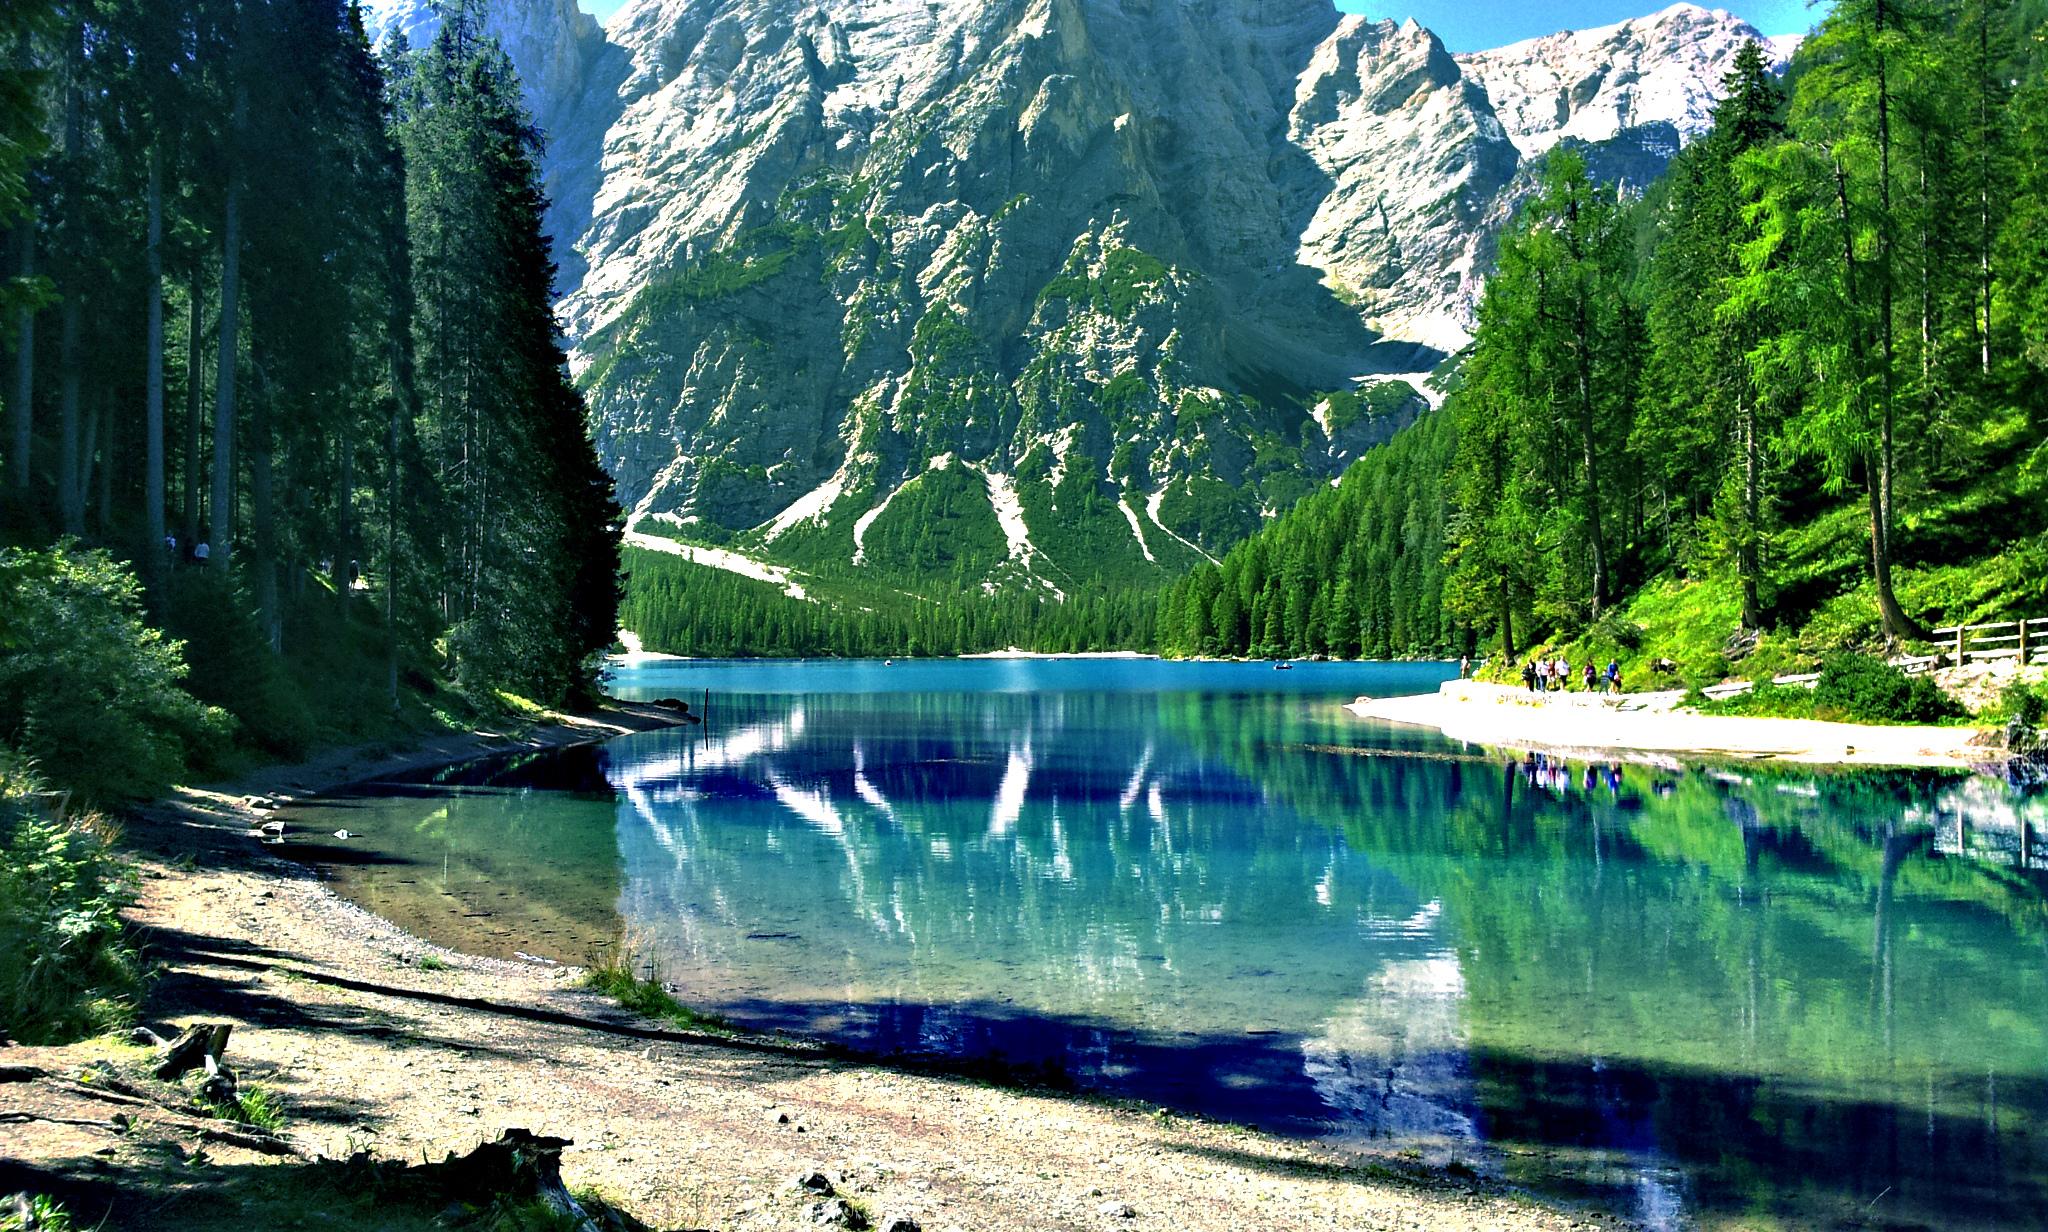 Relax at The Lake Braies Italy  YourAmazingPlacescom